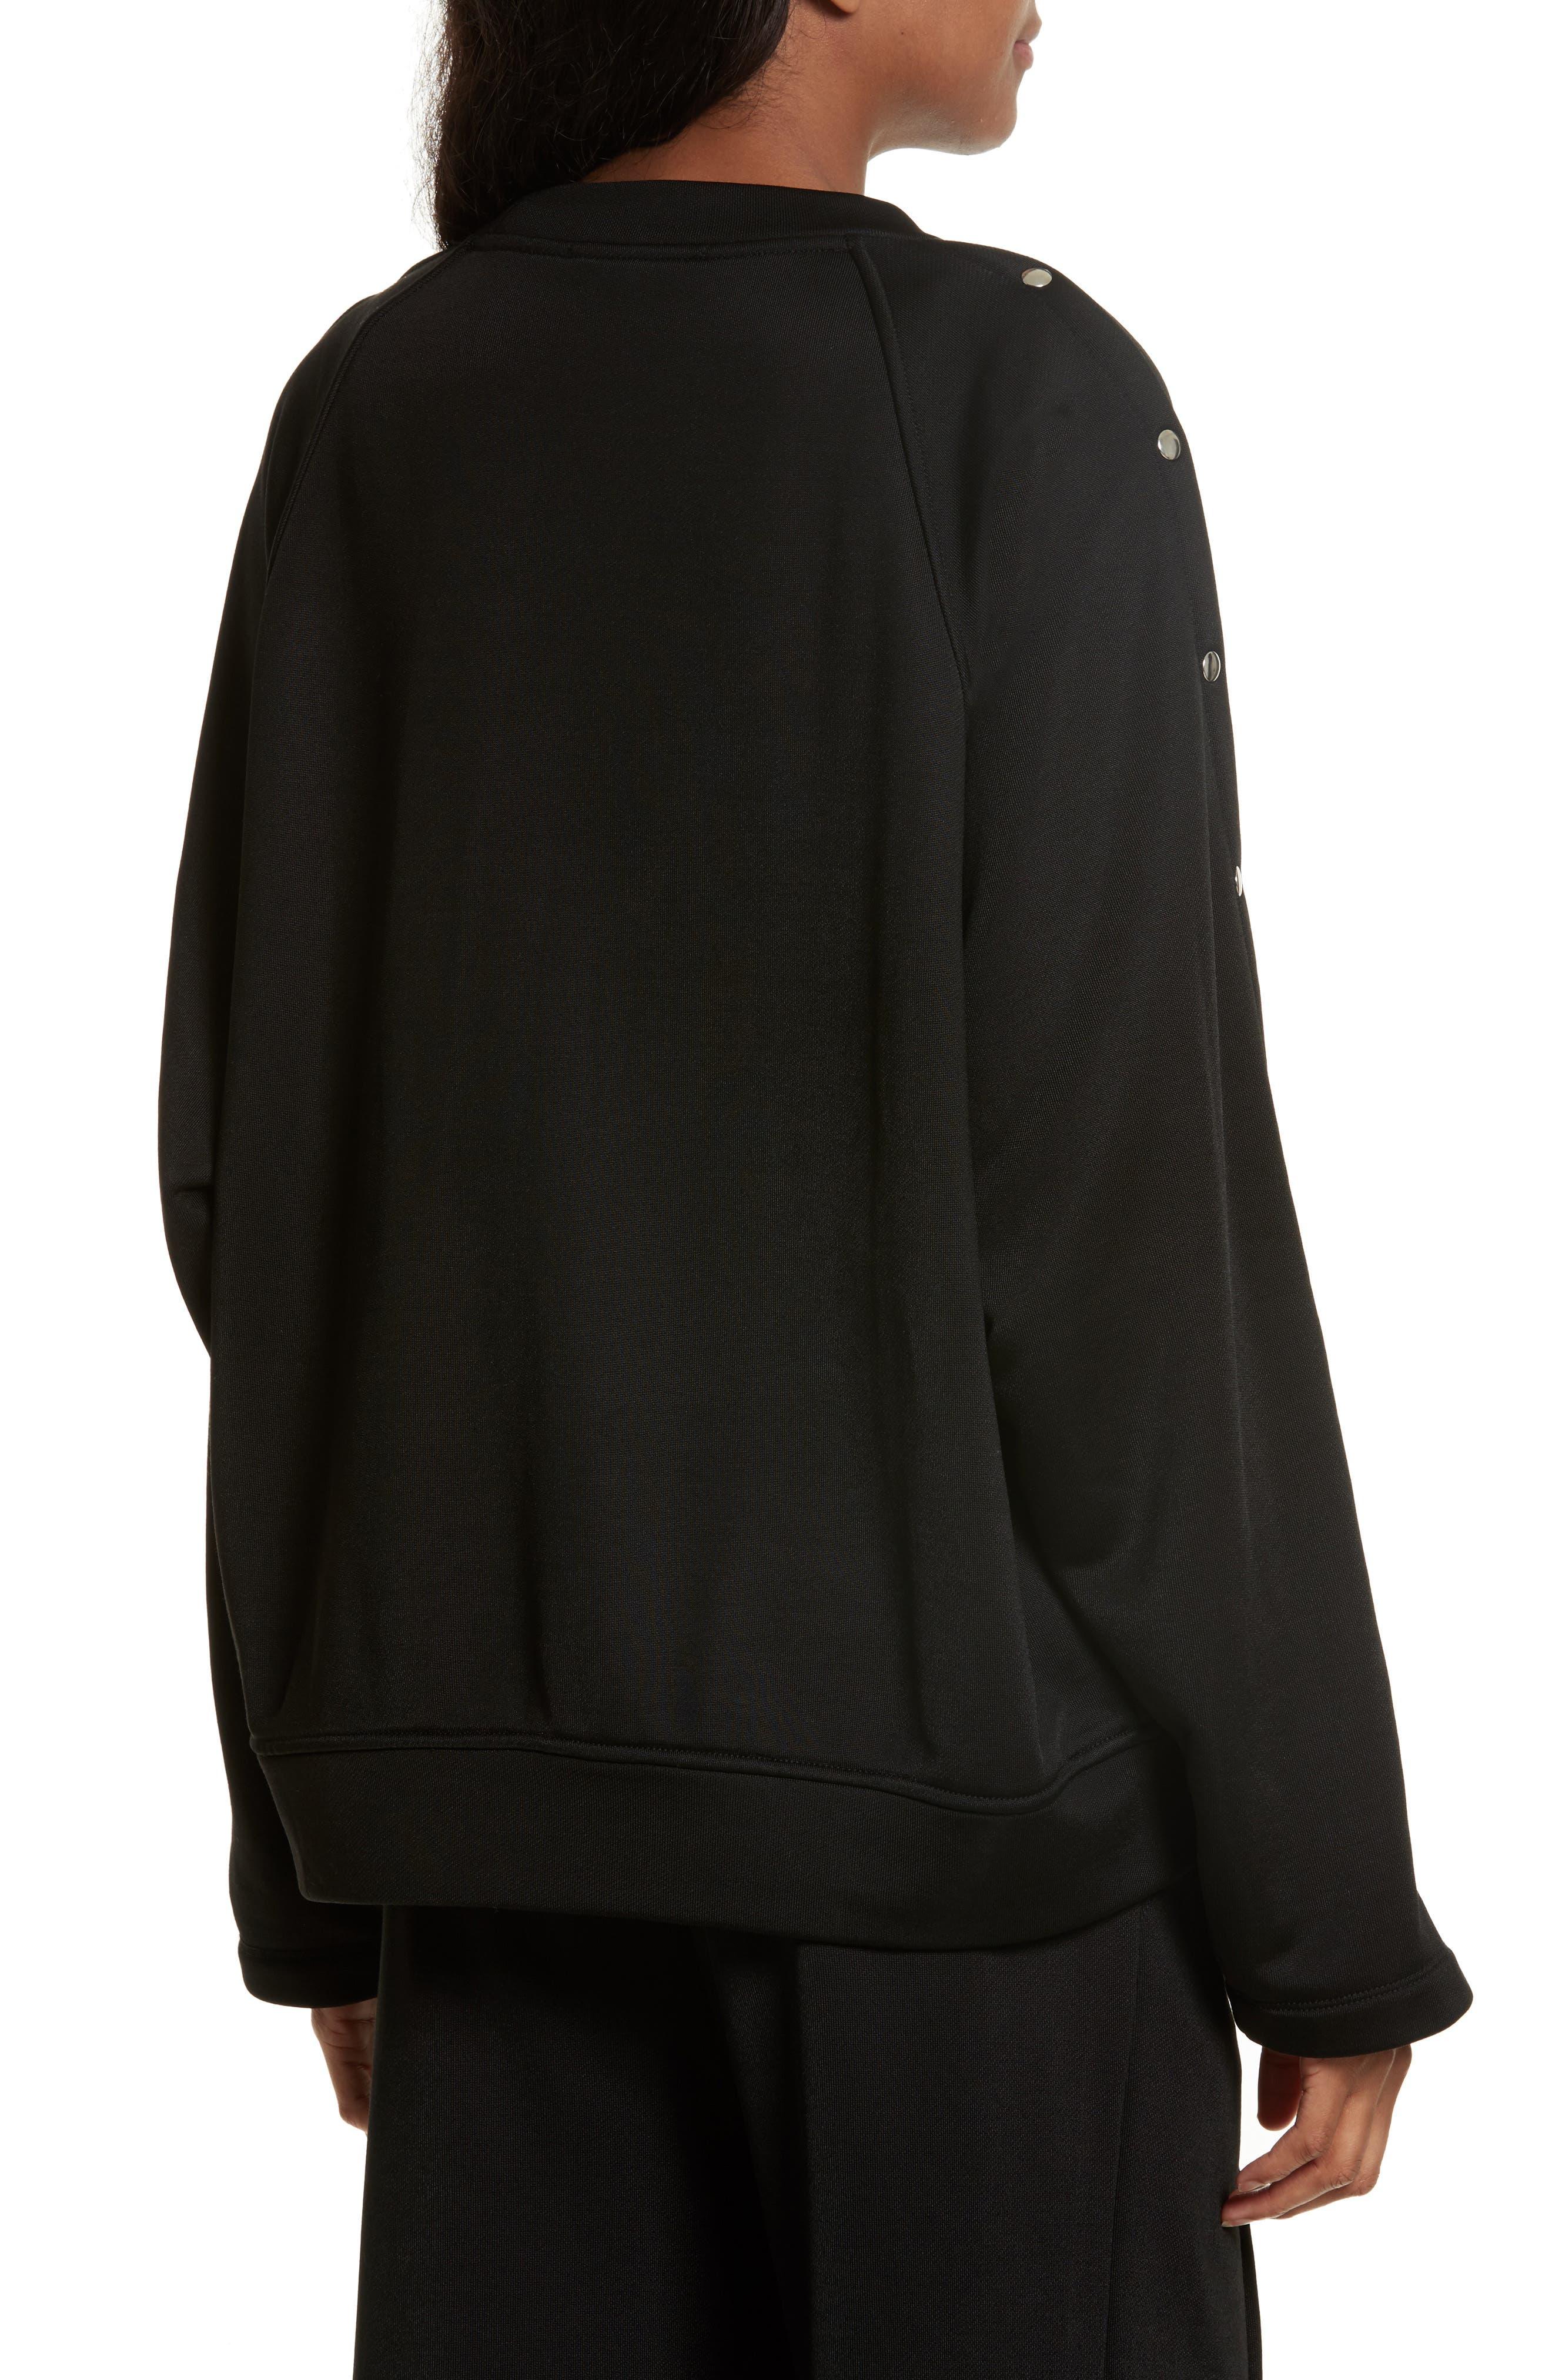 French Terry Sweatshirt,                             Alternate thumbnail 4, color,                             Black